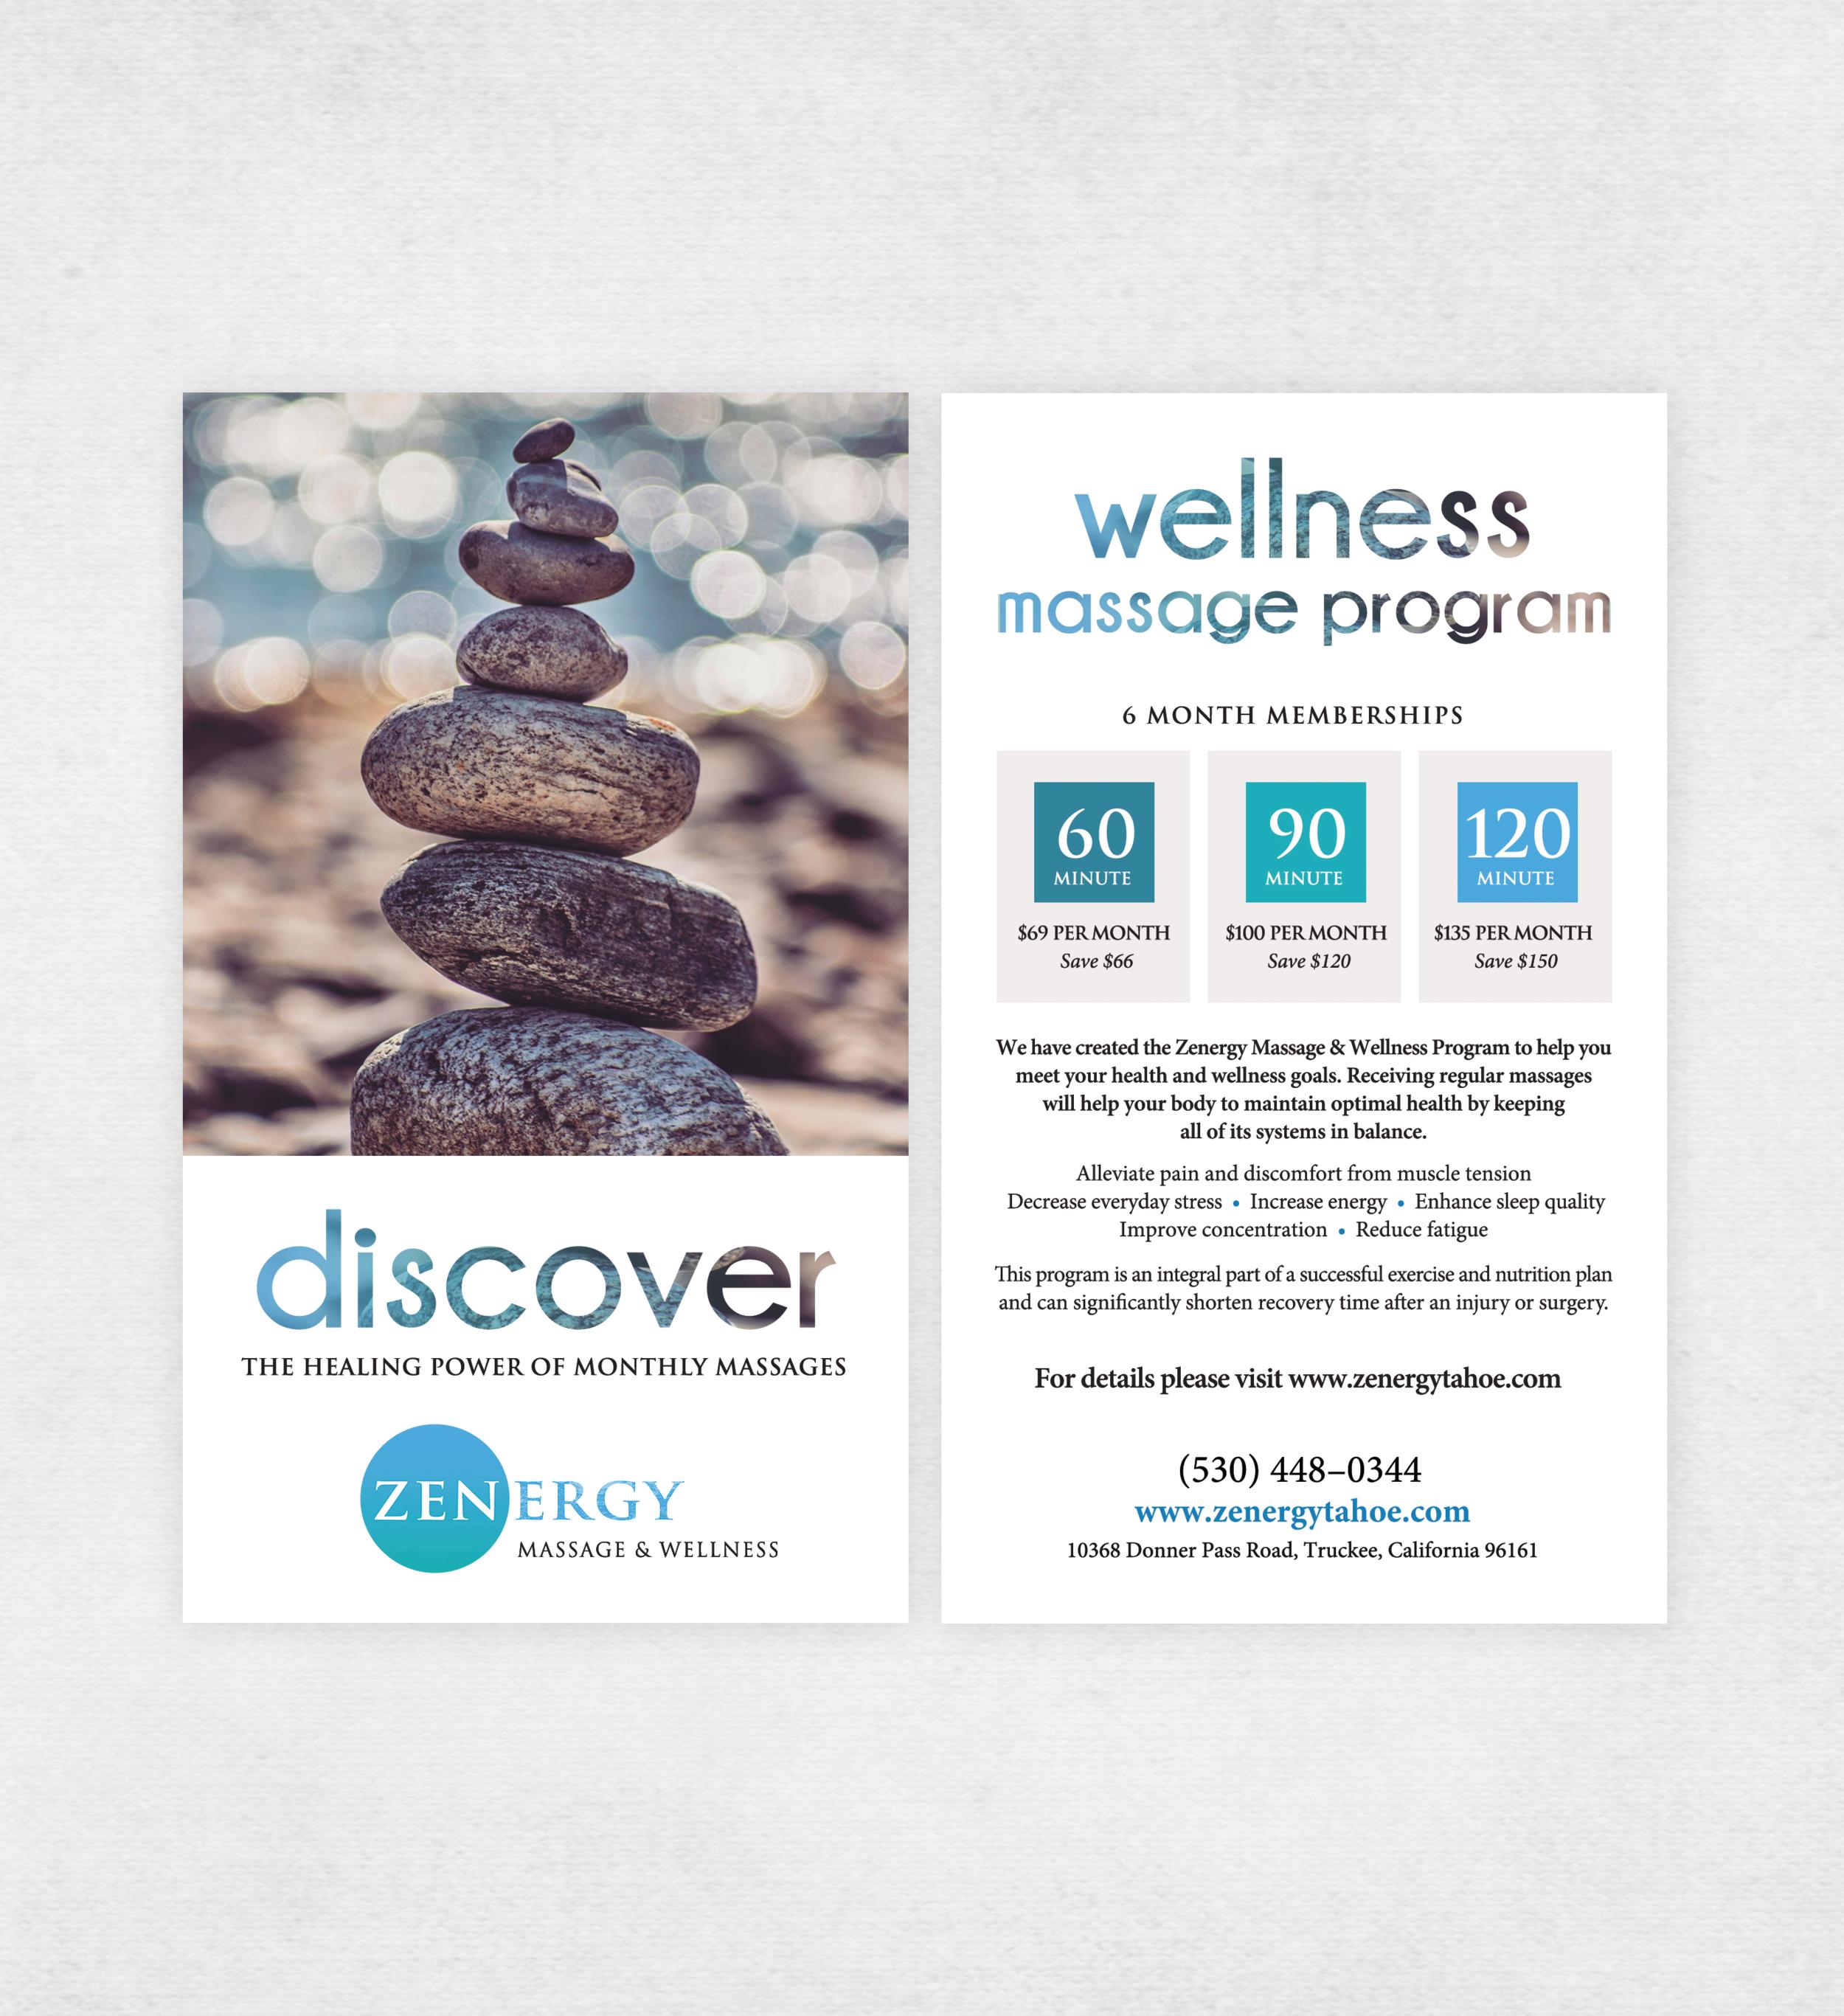 zenergy_wellnessPostcard_general_ALL.png